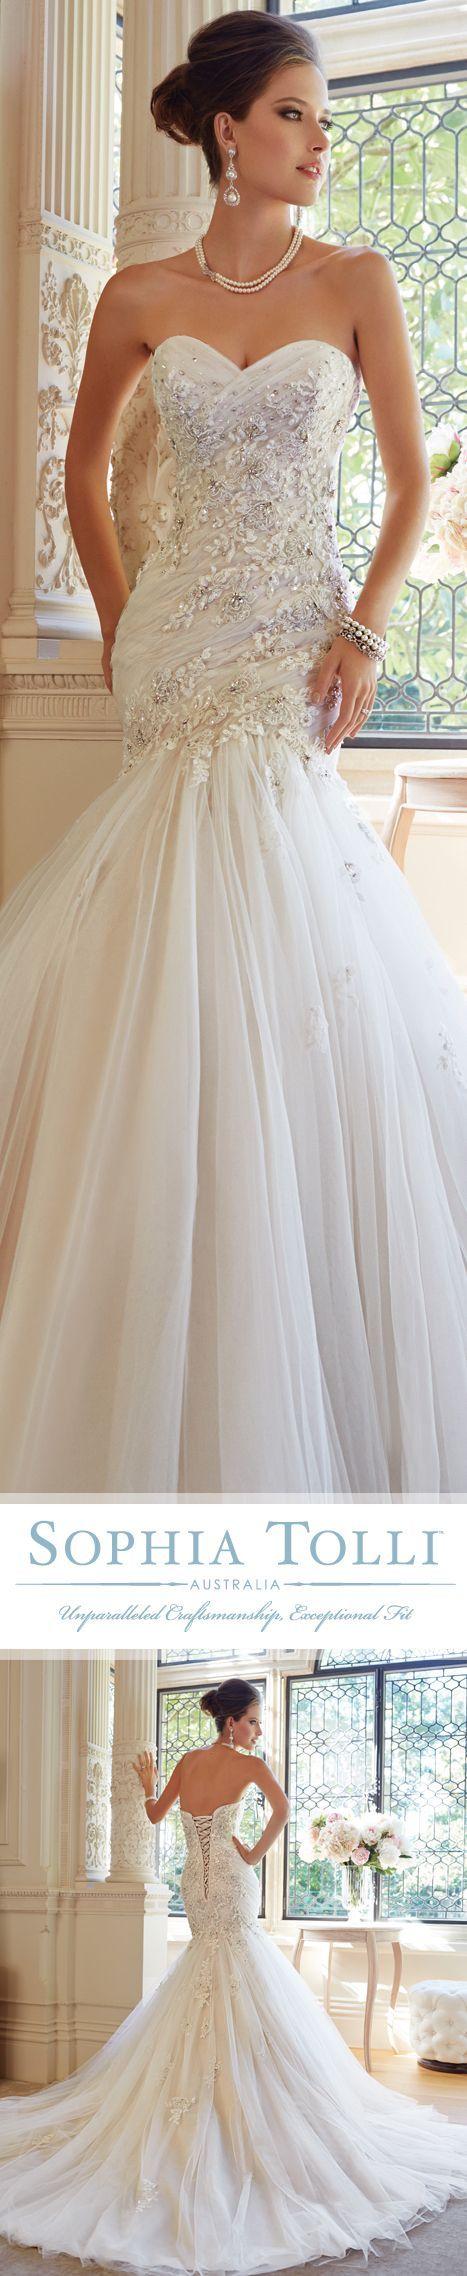 Tendance Robe De Mariée 2017/ 2018 : Bridal Dresses  »  Sophia Tolli